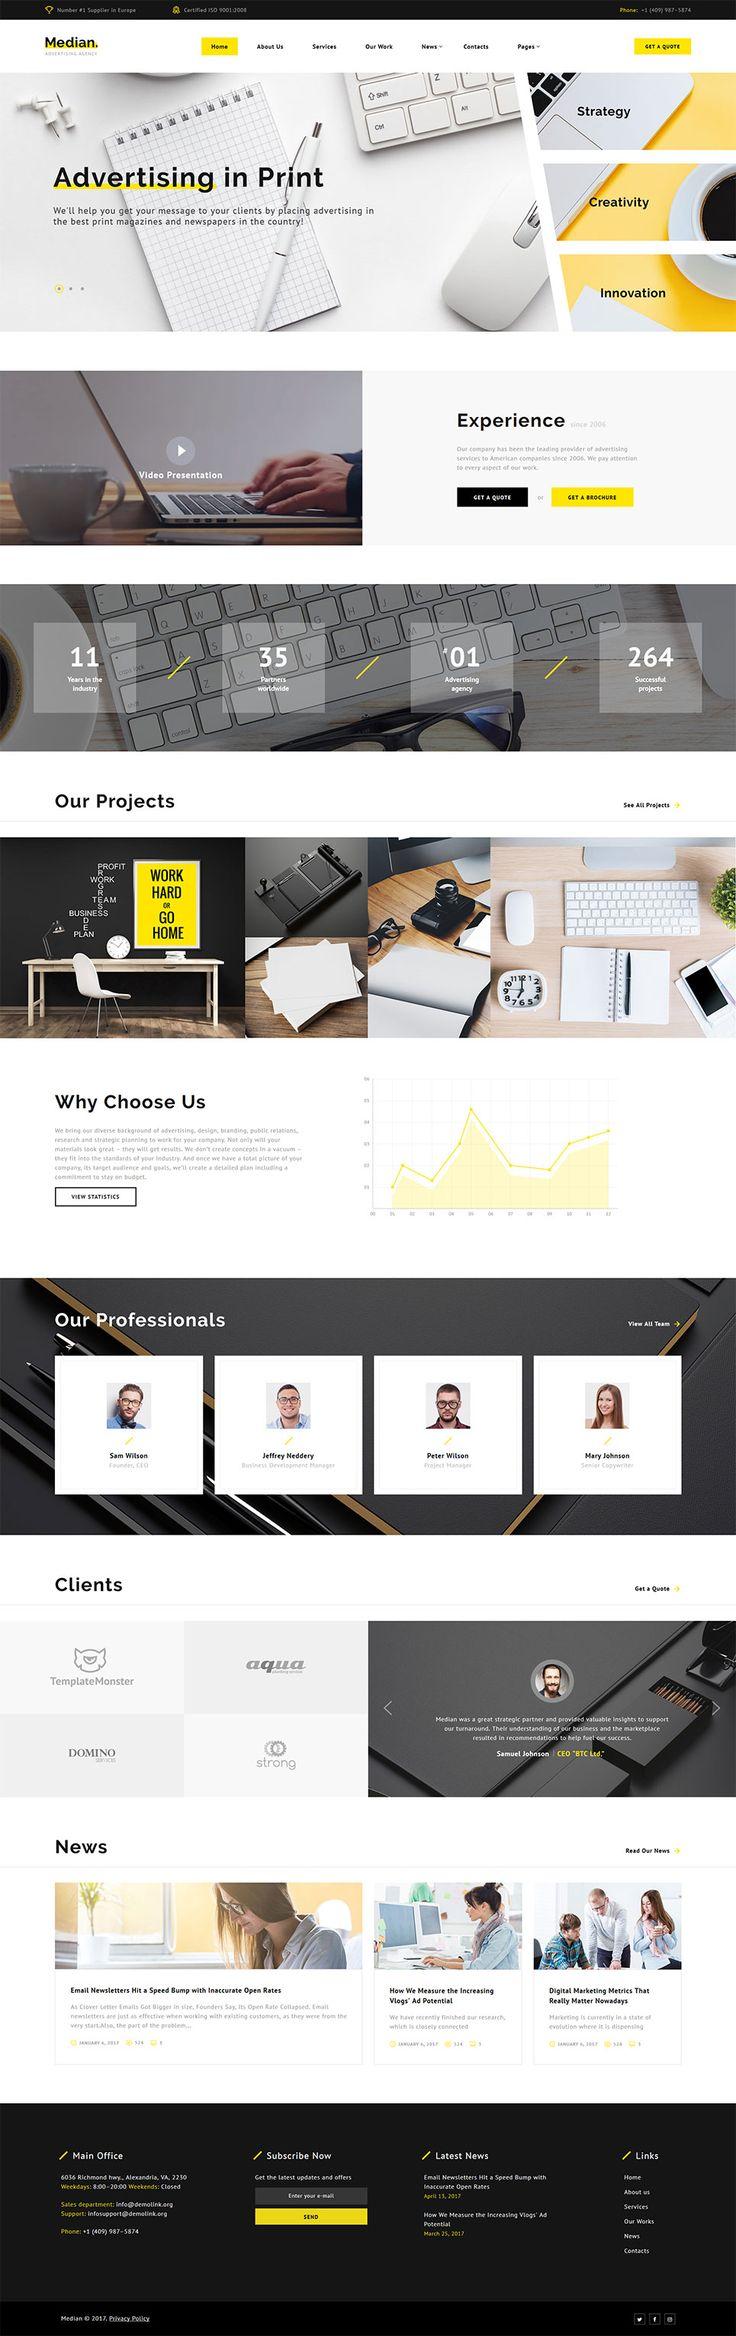 Median - Advertising Agency HTML5 Website Template